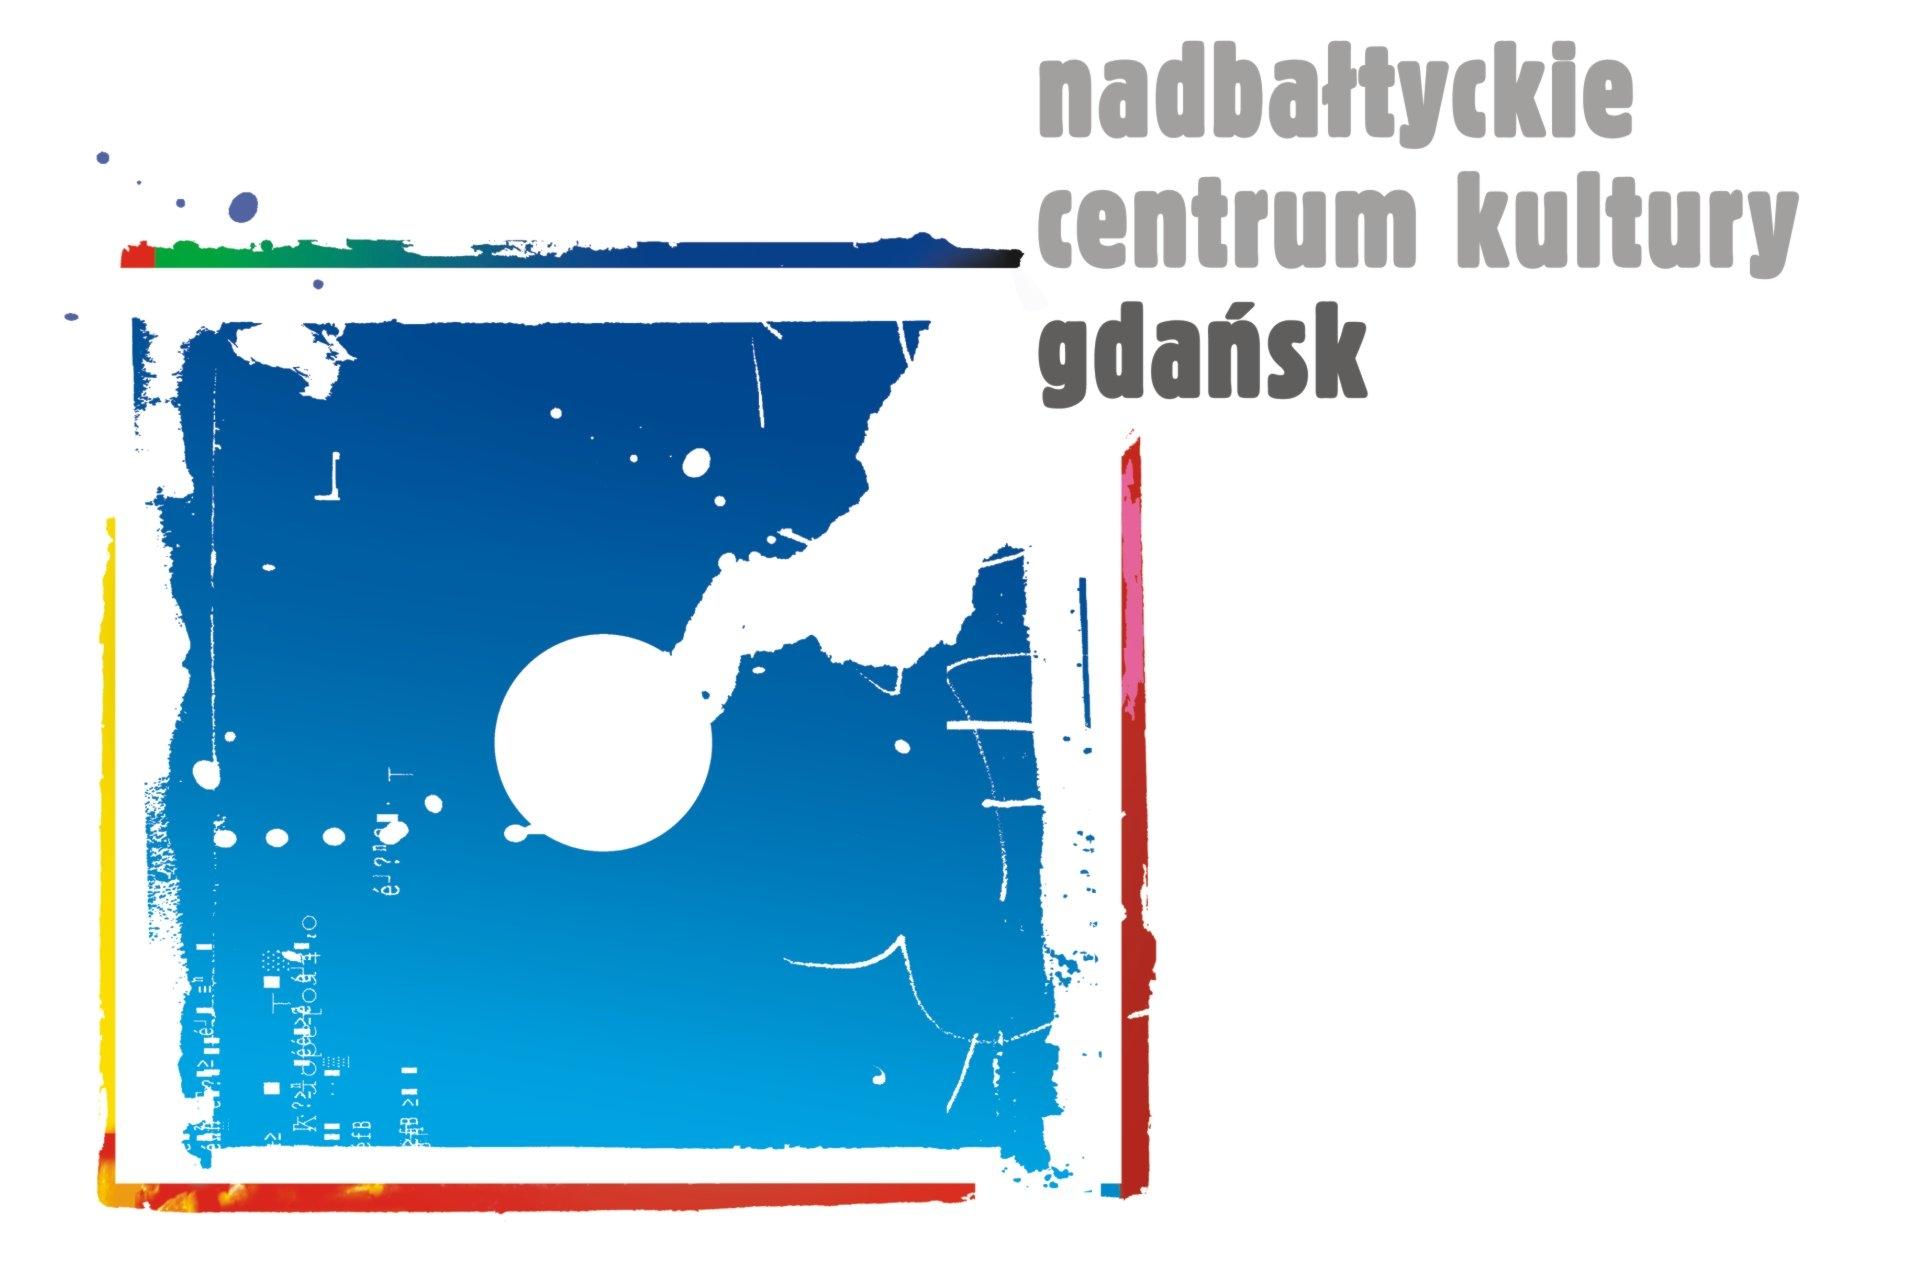 logo NCK.JPG